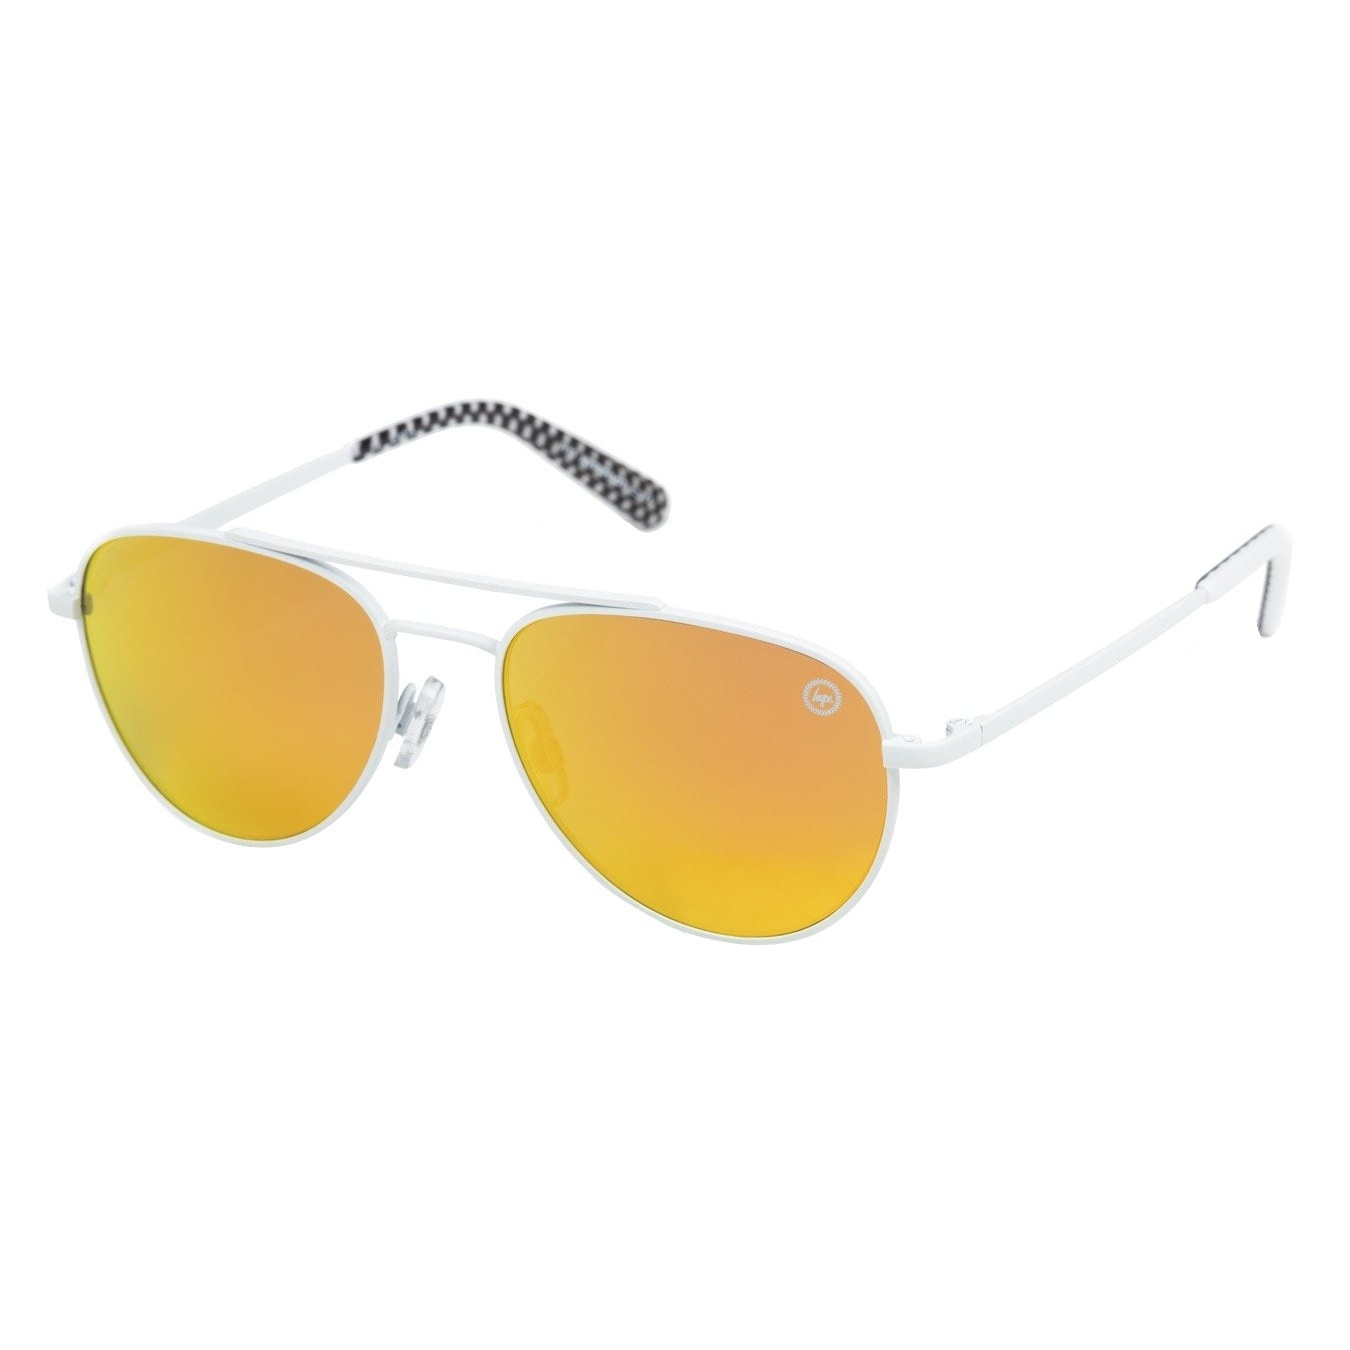 Hype Sonnenbrille Unisex Karo Hypepilot Sonnenbrille Herrenmode/Schmuck & Accessoires/Accessoires/Sonnenbrillen/Eckige Sonnenbrille